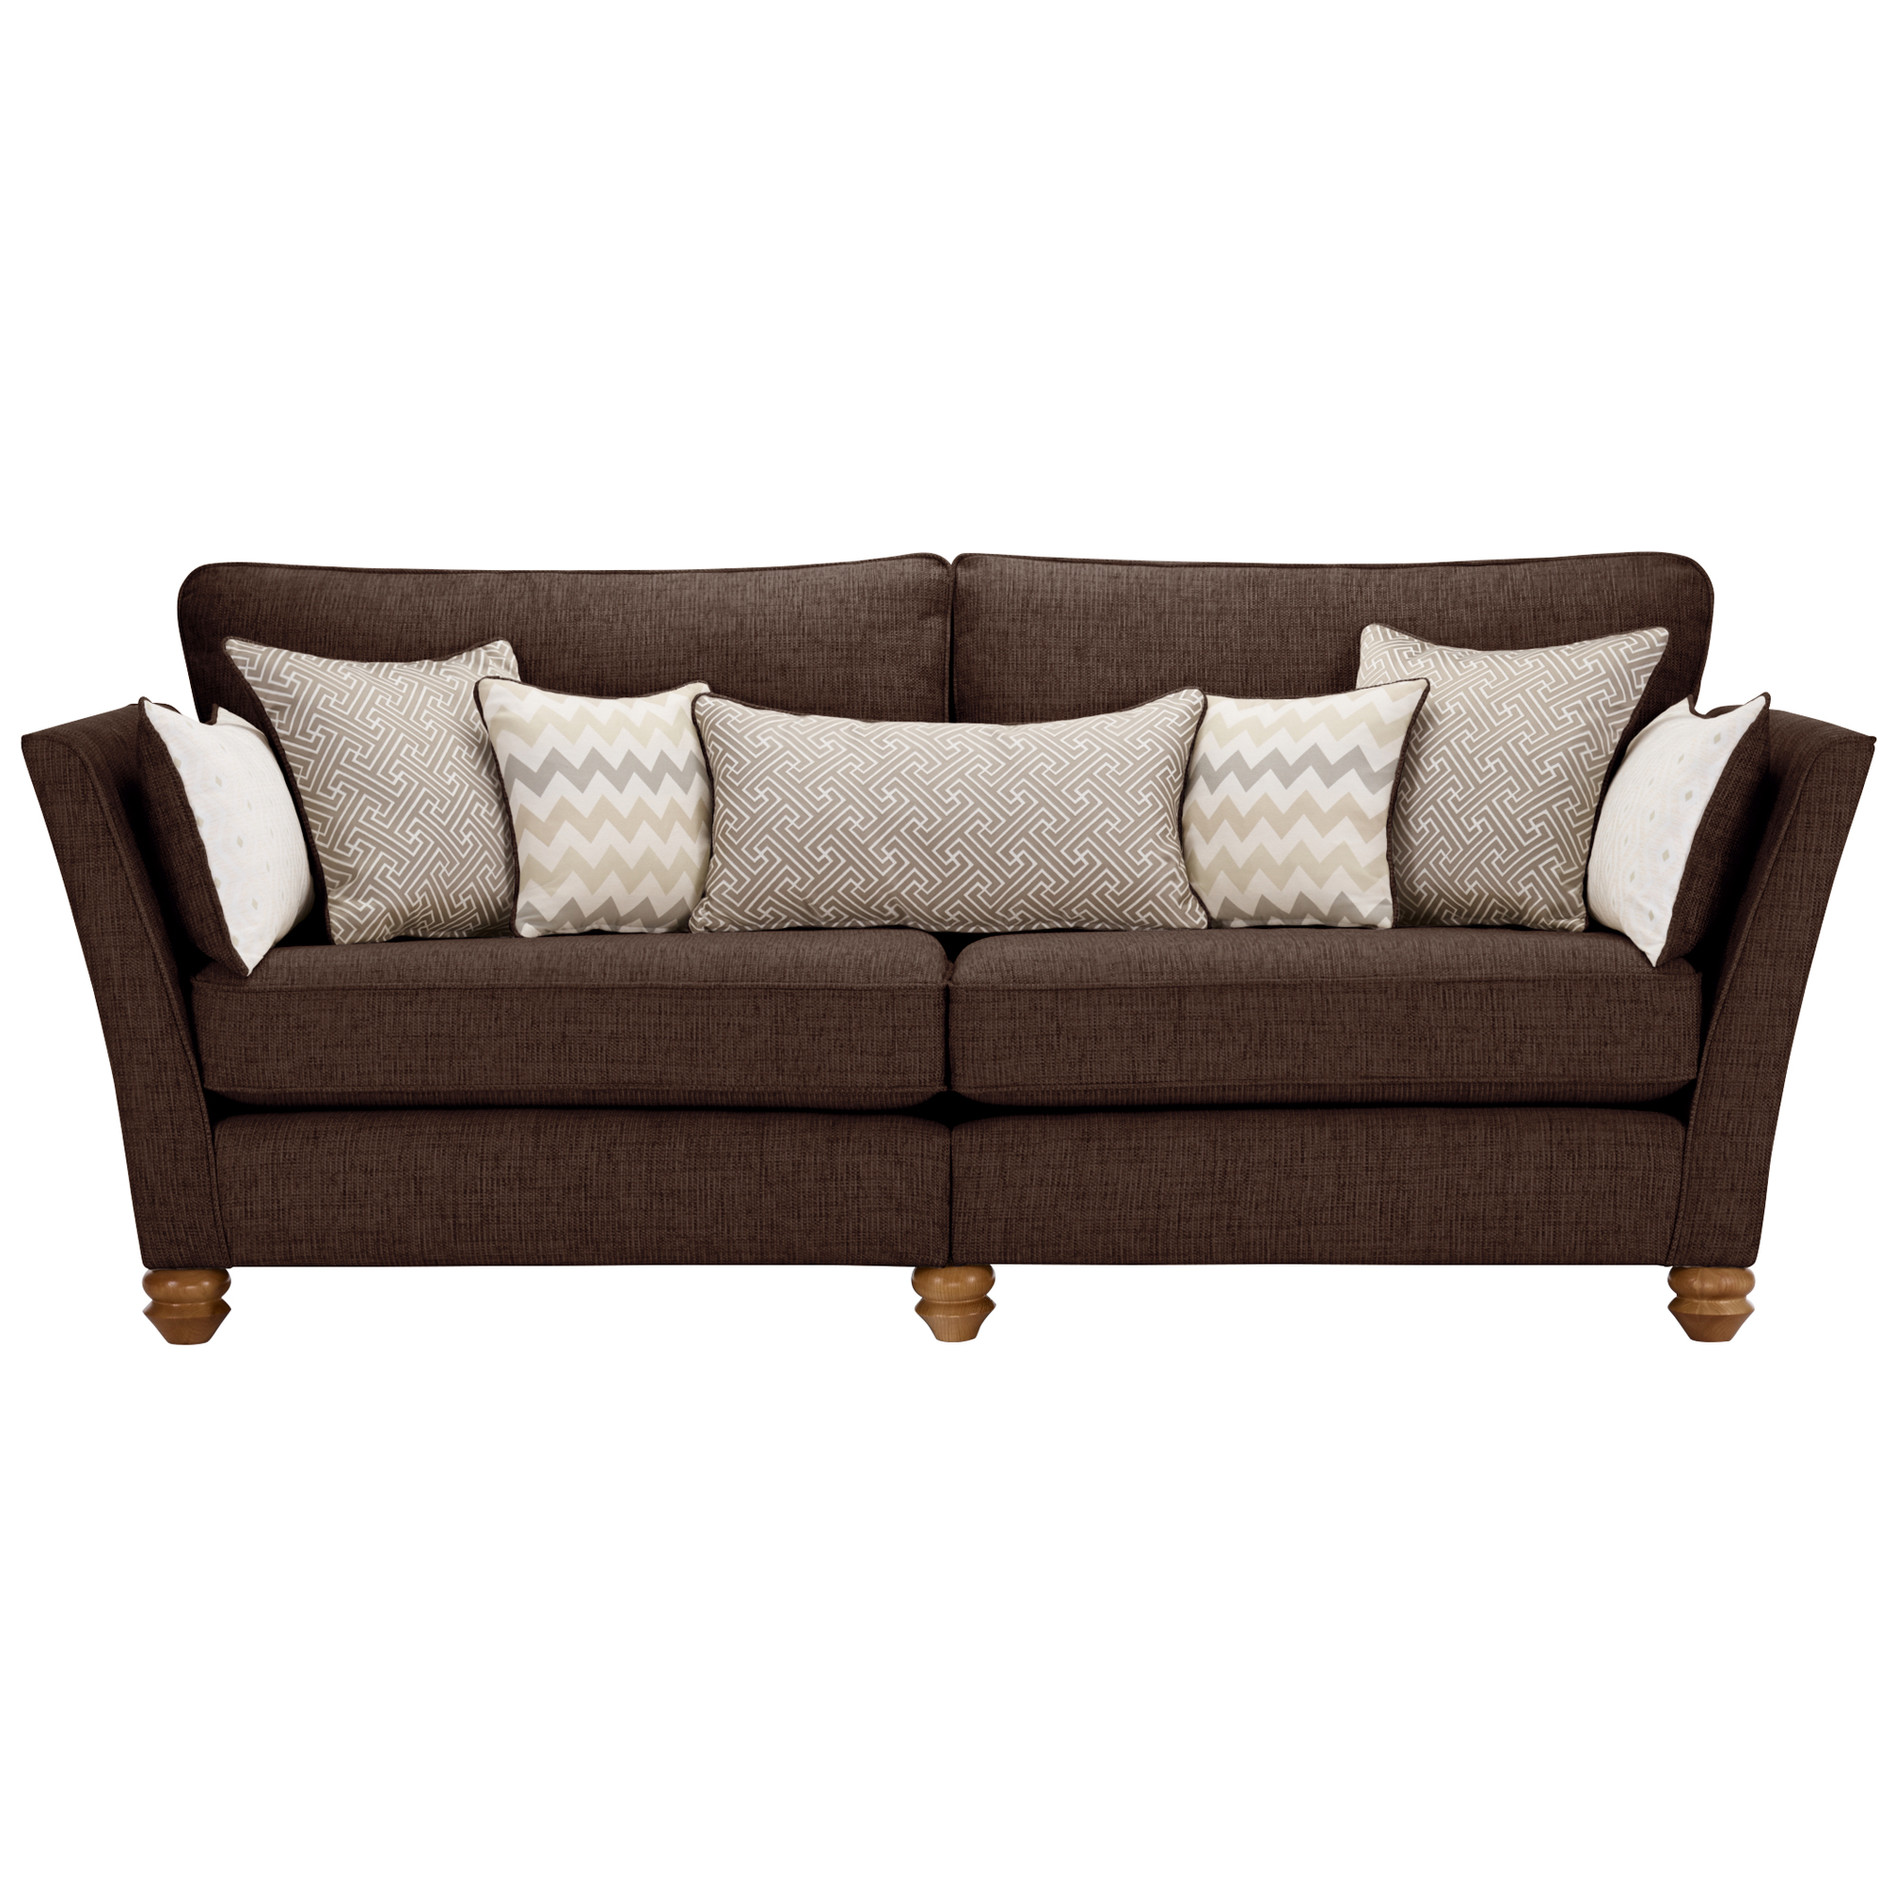 Gainsborough 4 seater sofa in brown oak furniture land for Sofa bed 5ft